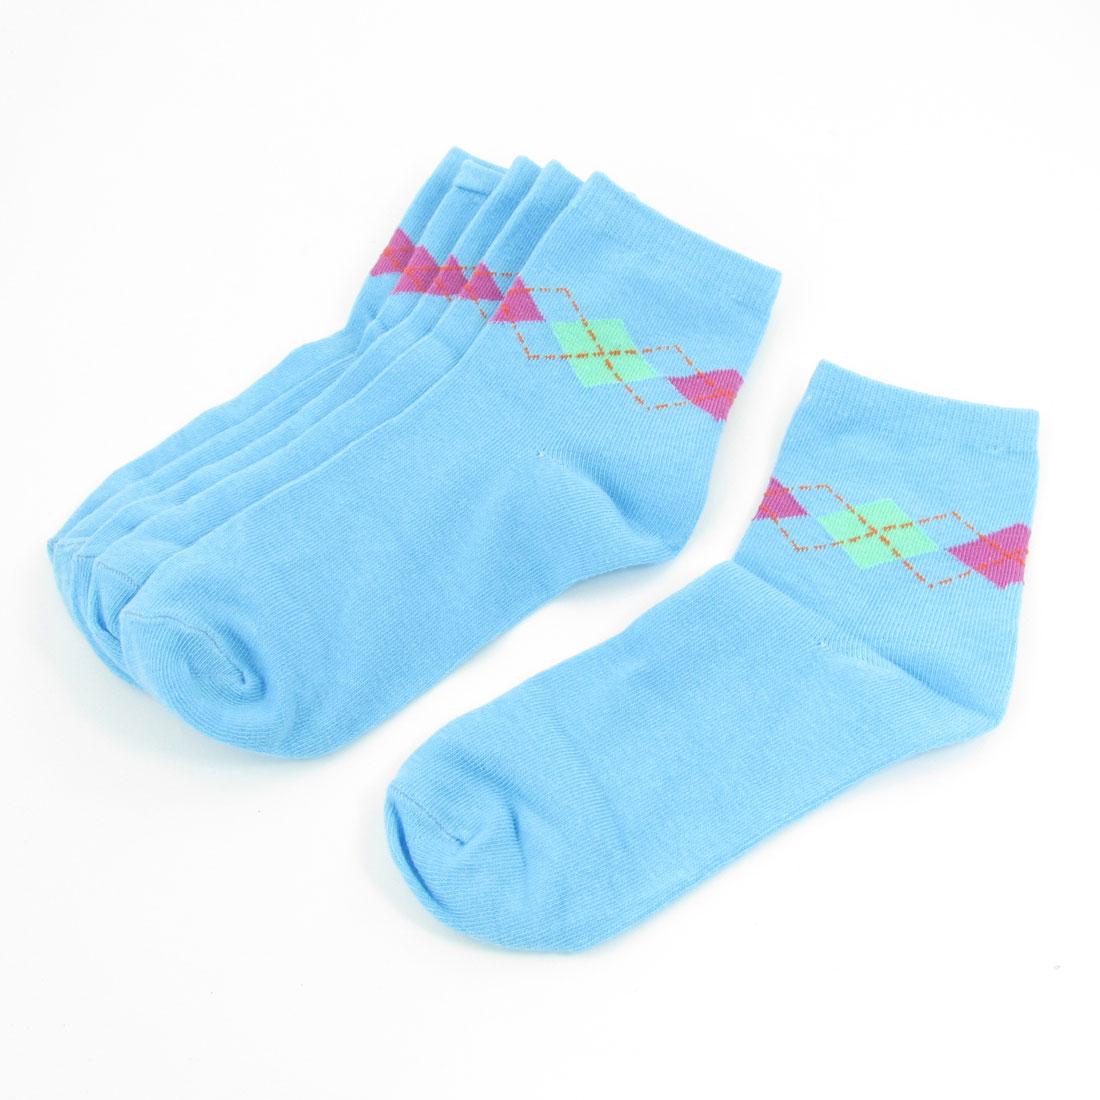 3 Pairs Blue Elastic Cuff Rhombus Prints Socks Hosiery for Woman